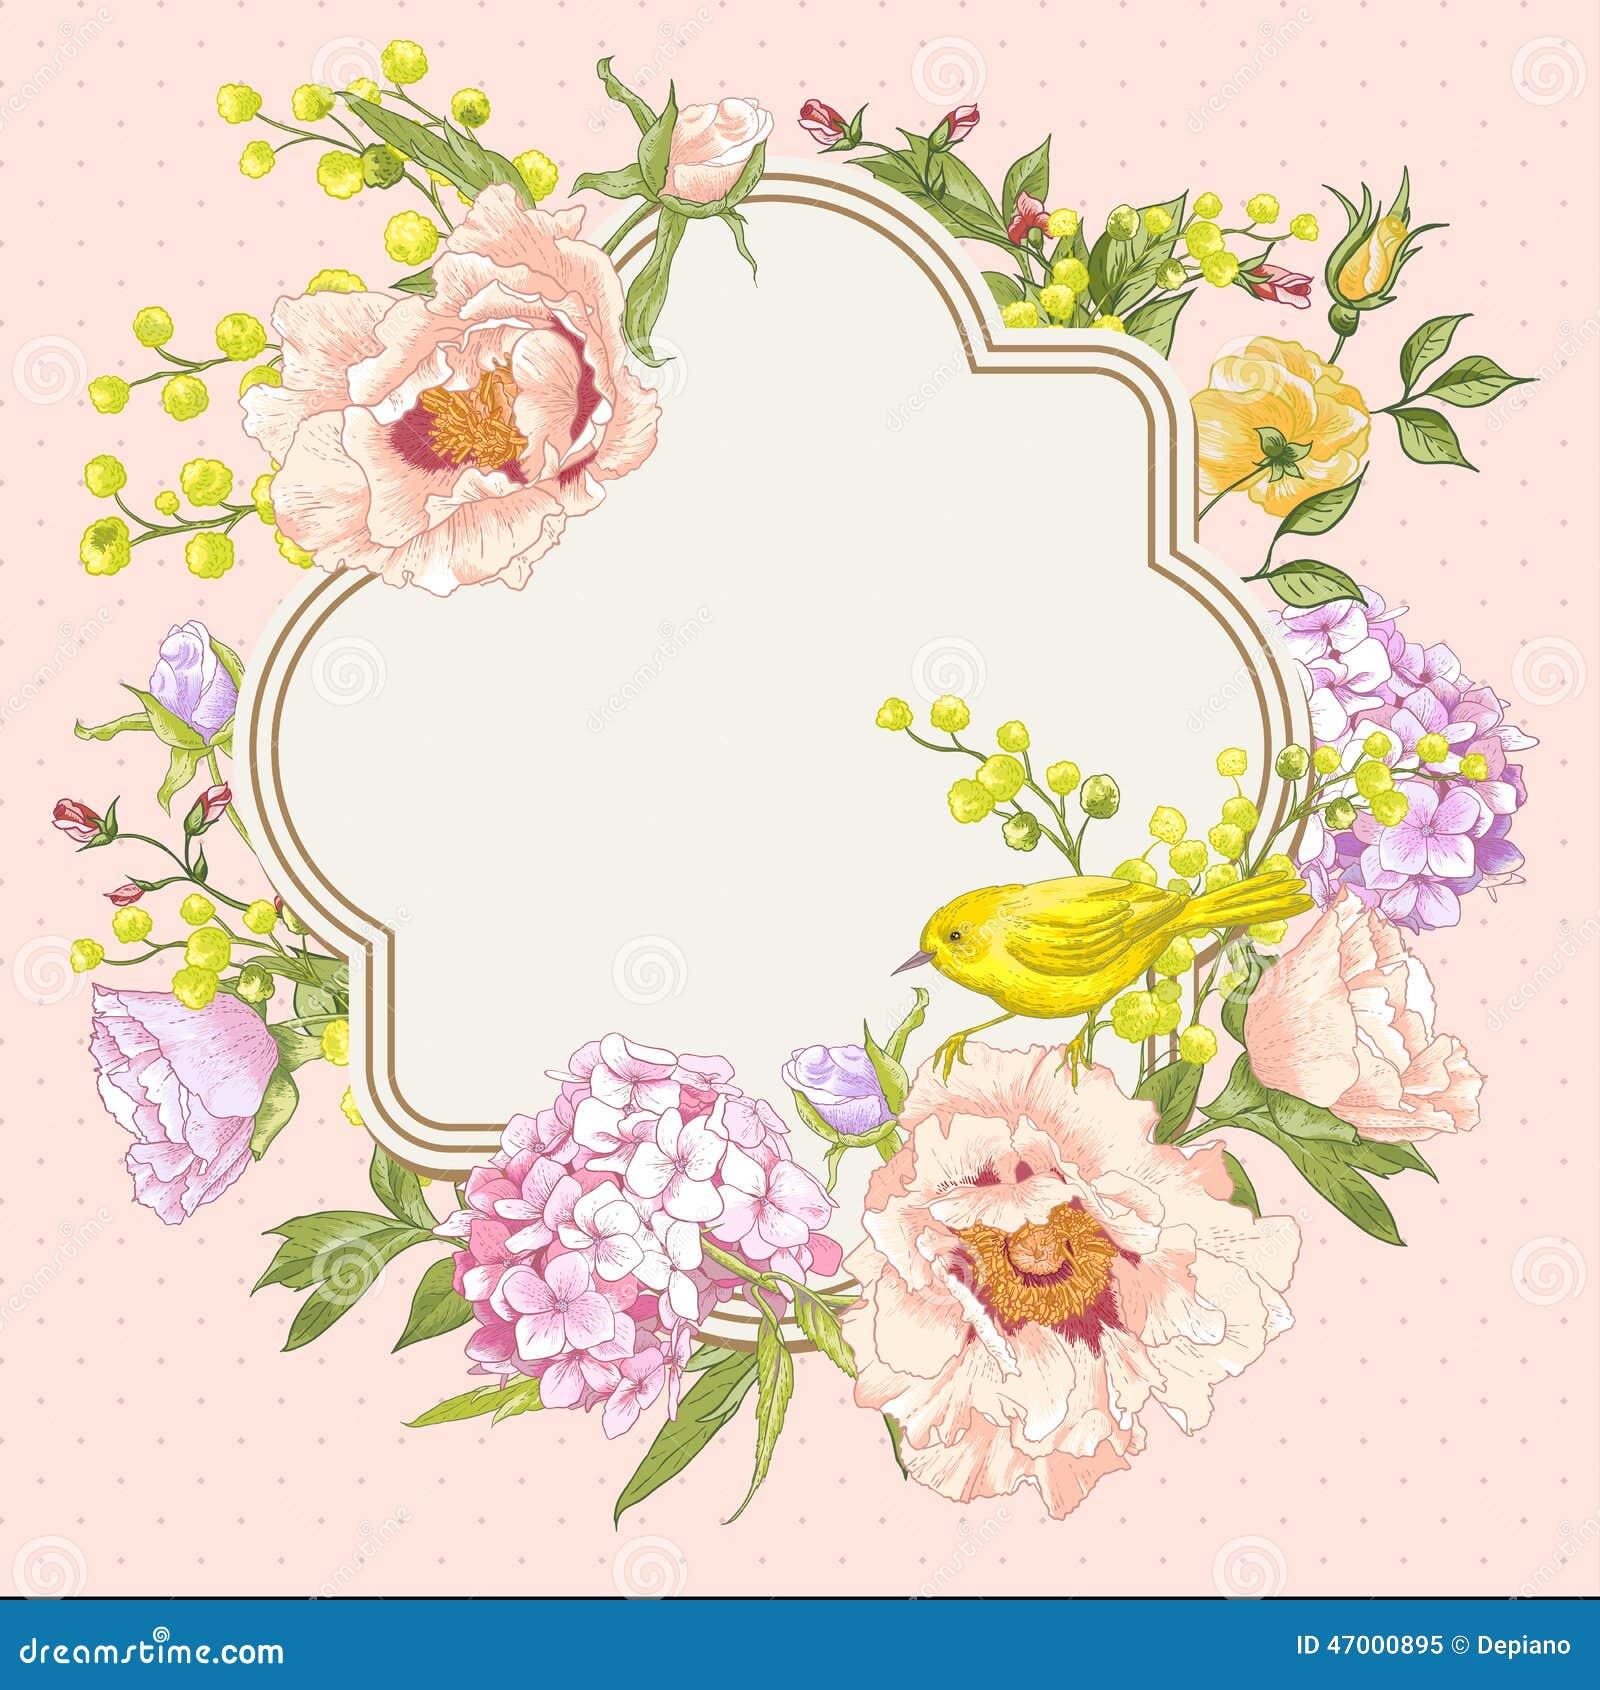 spring vintage floral bouquet with birds stock vector hydrangea clip art no background hydrangea clip art b&w